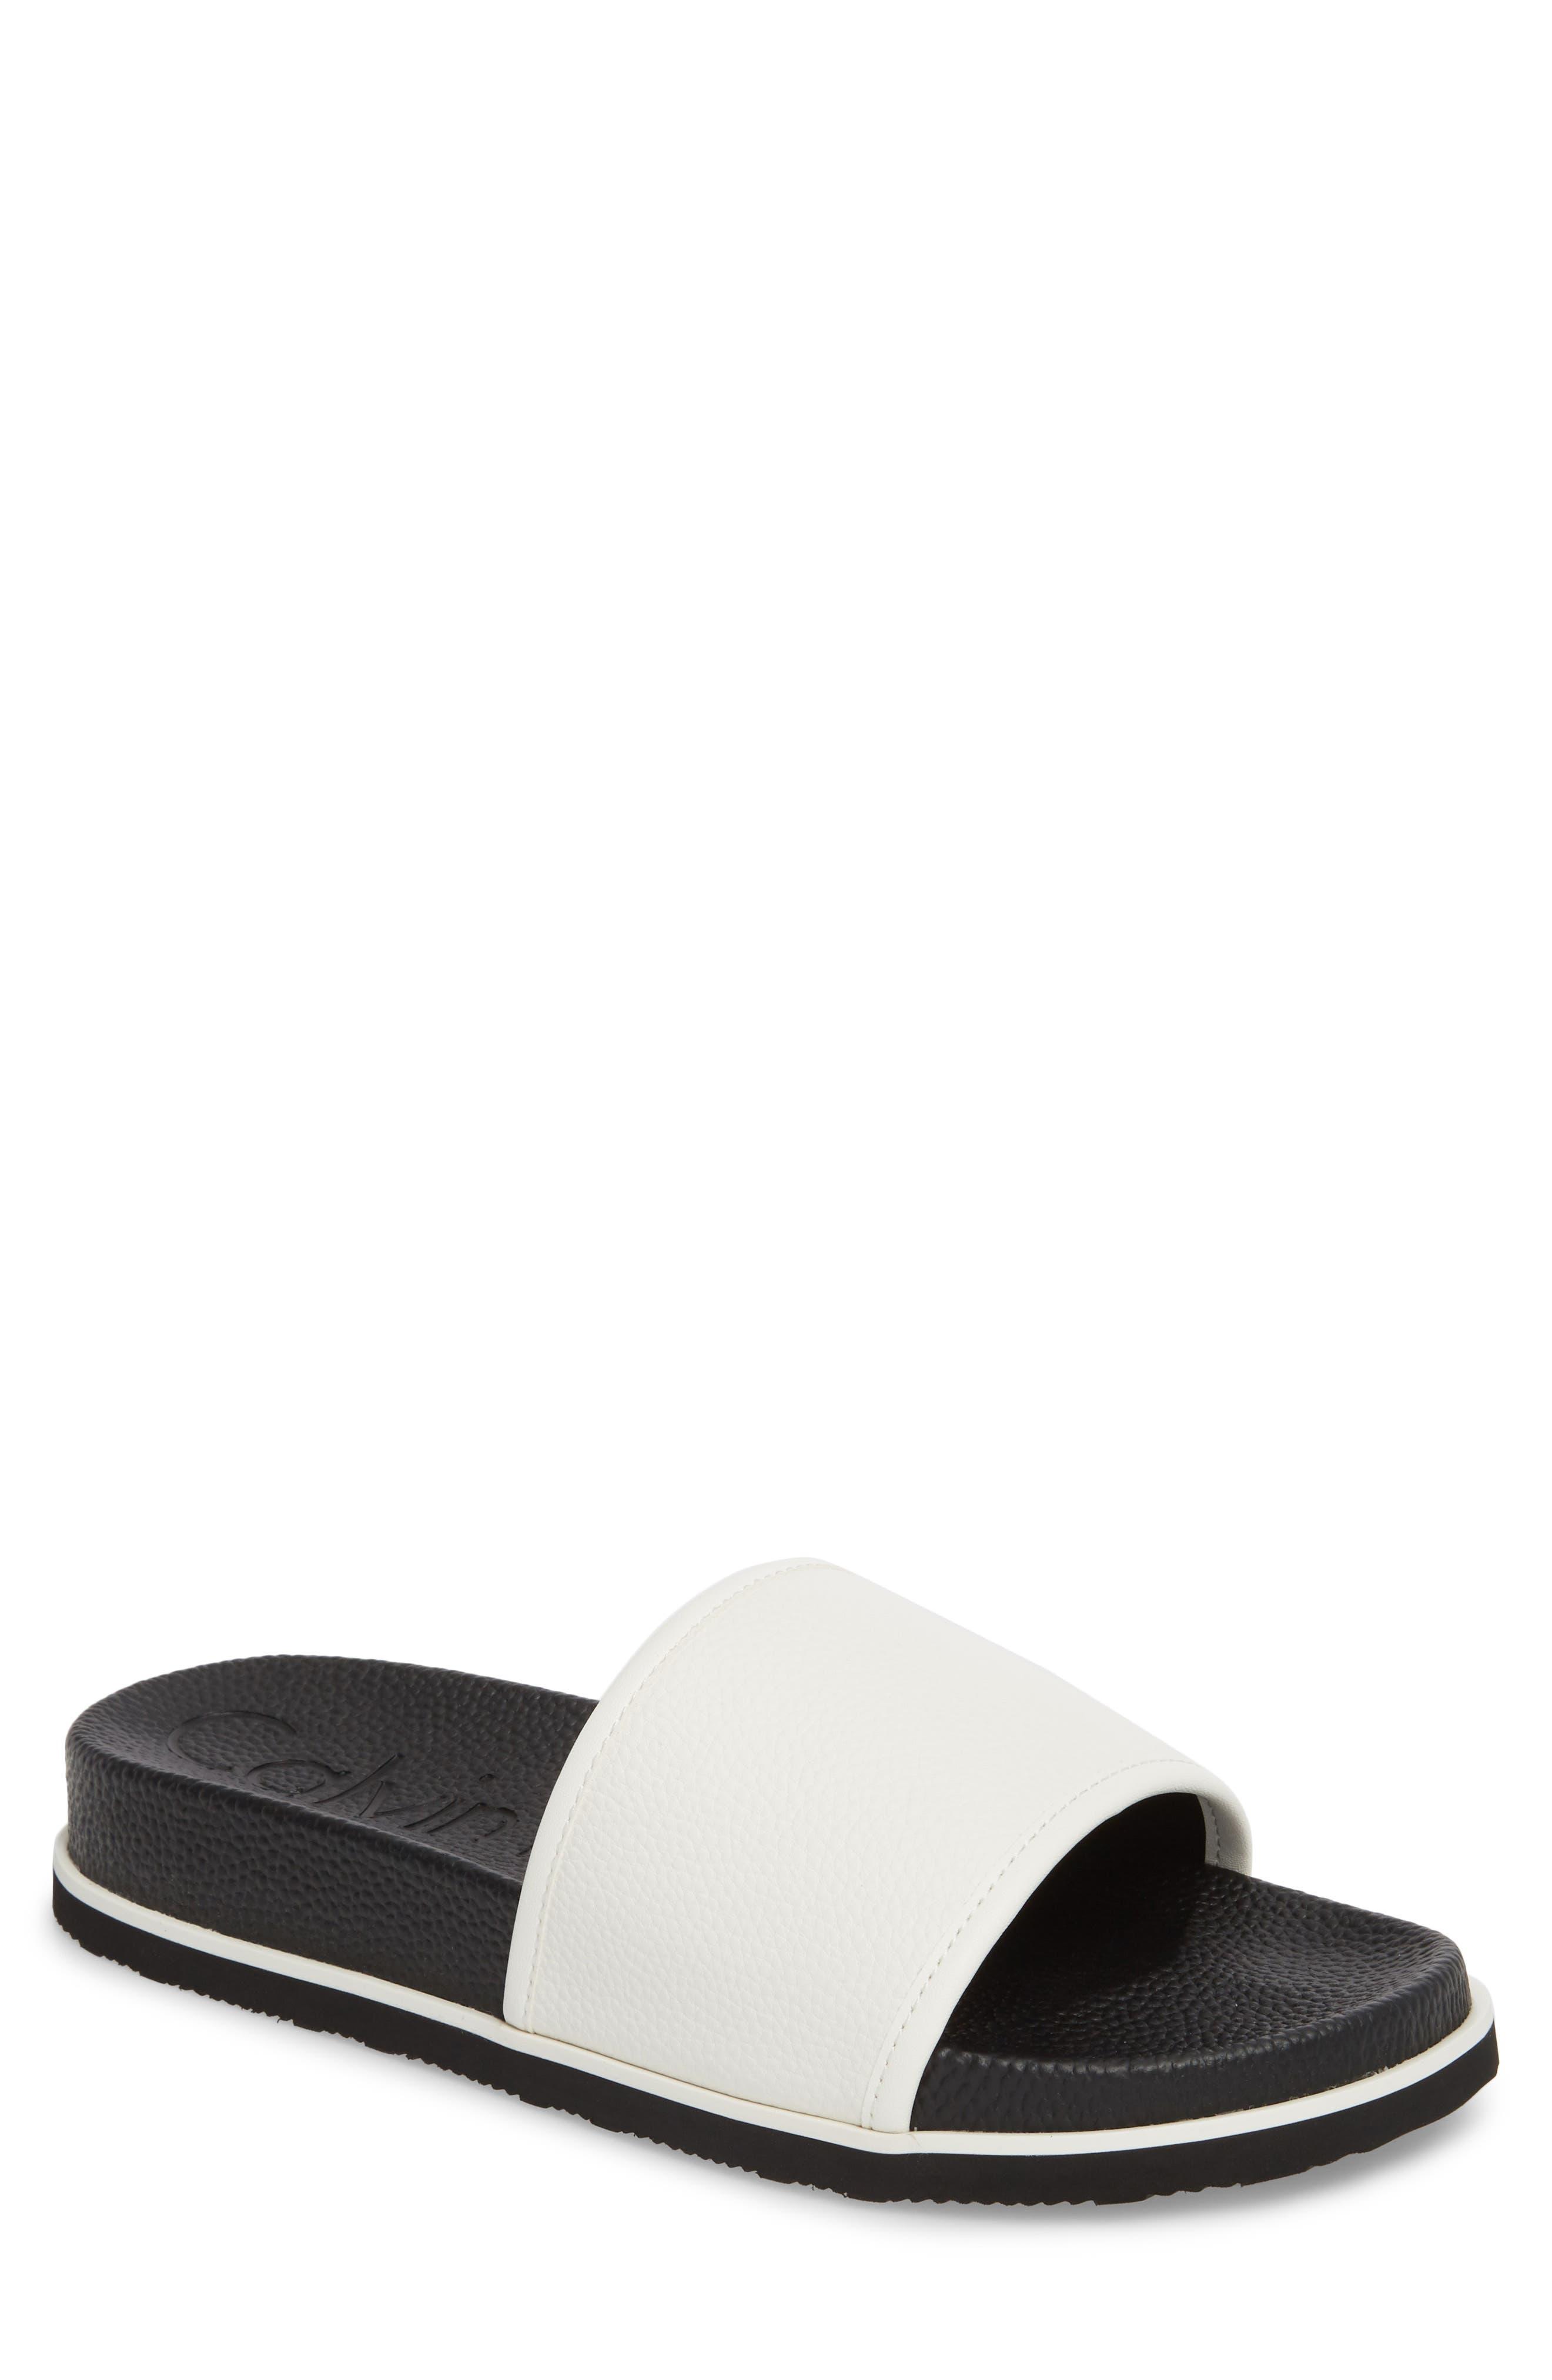 Mackee Sport Slide,                             Main thumbnail 1, color,                             White Leather